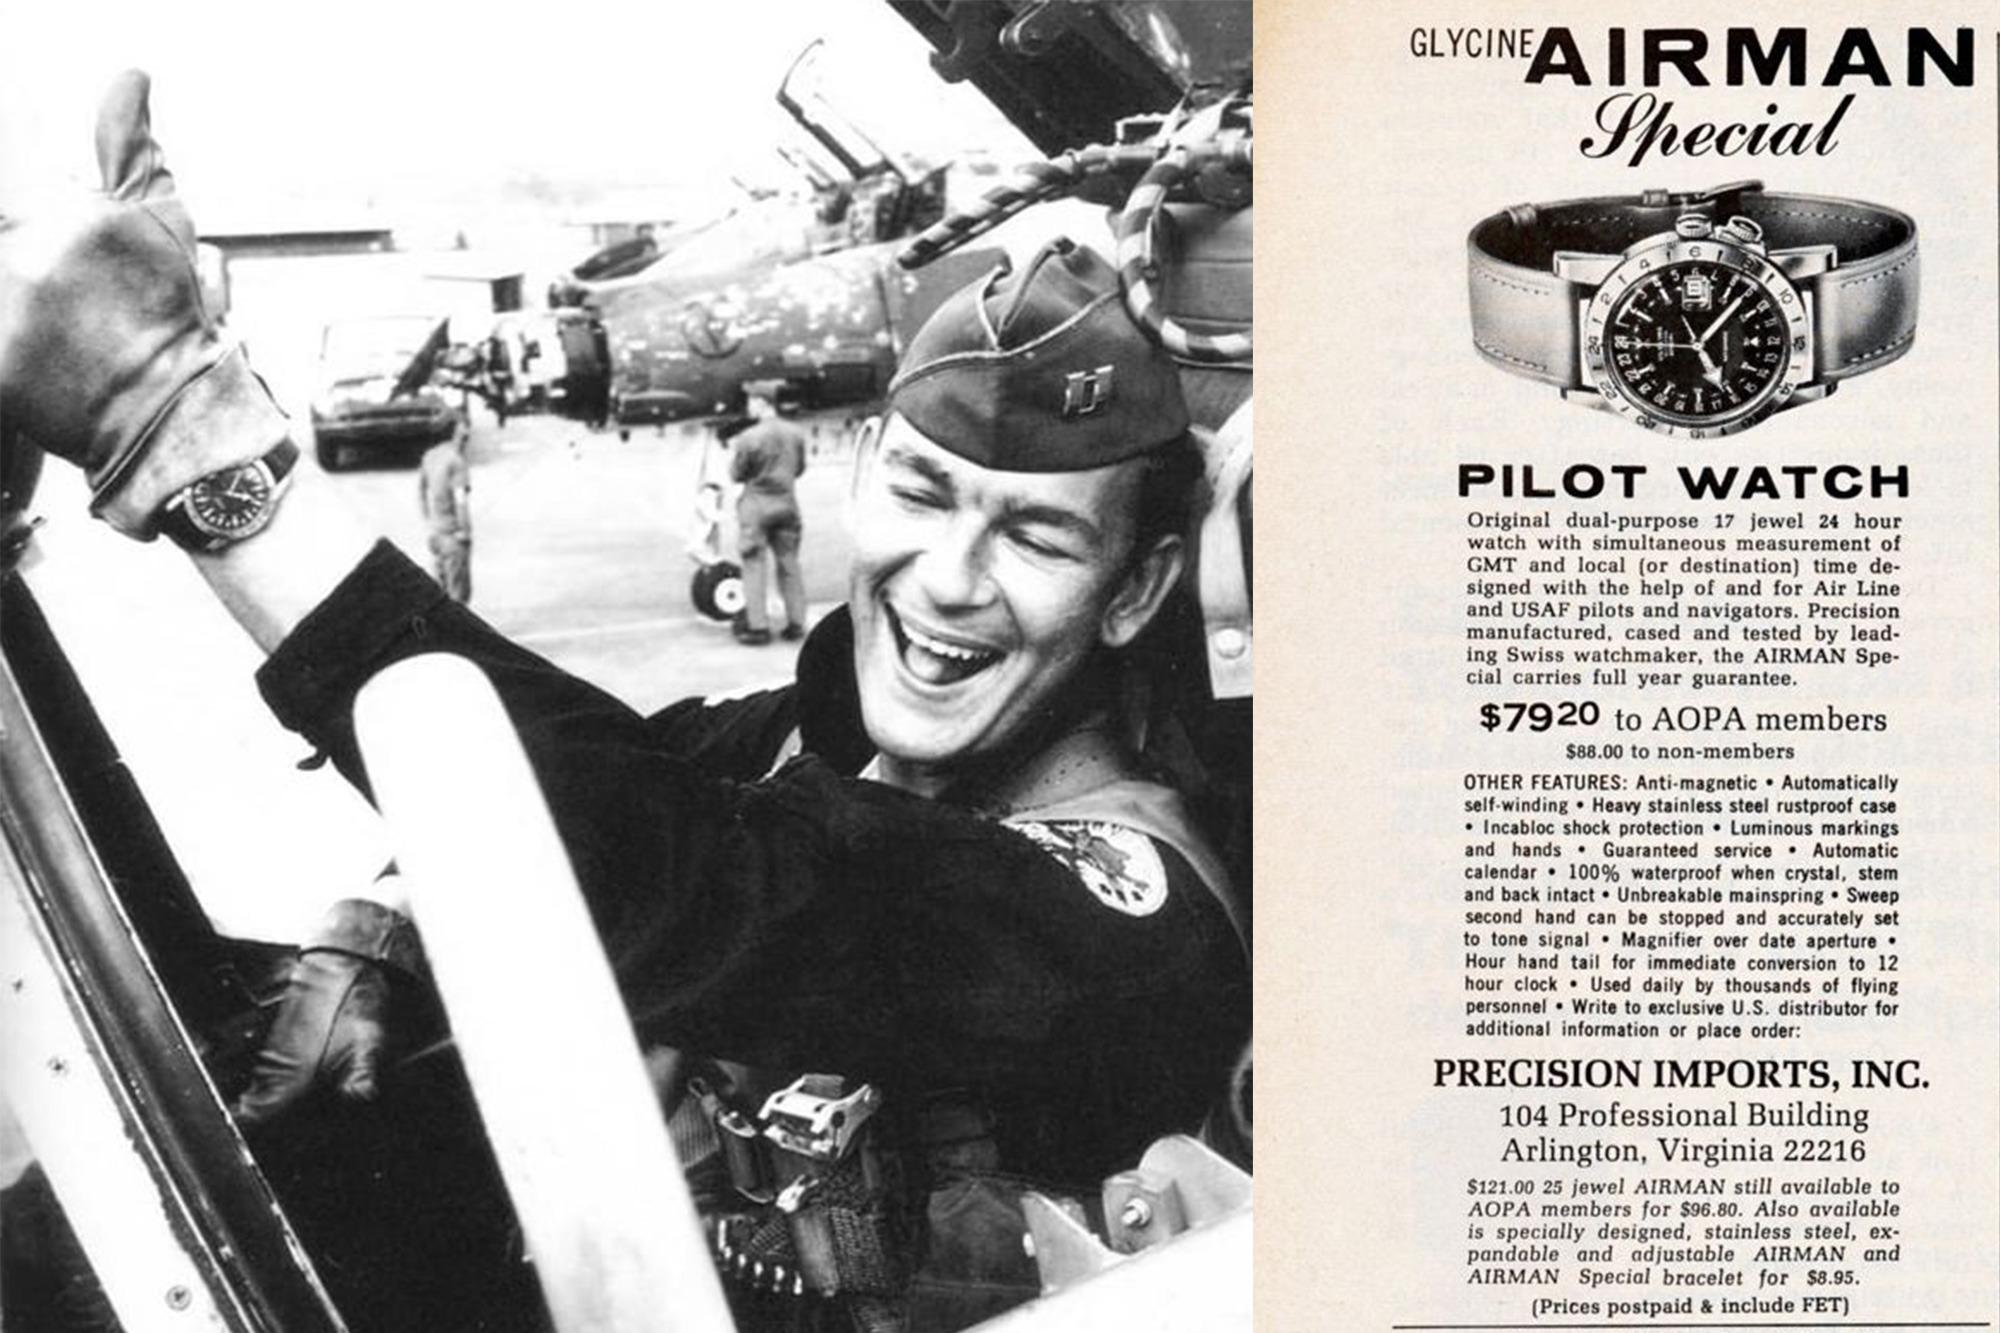 Glycine Airman - US Air Force - Vietnam